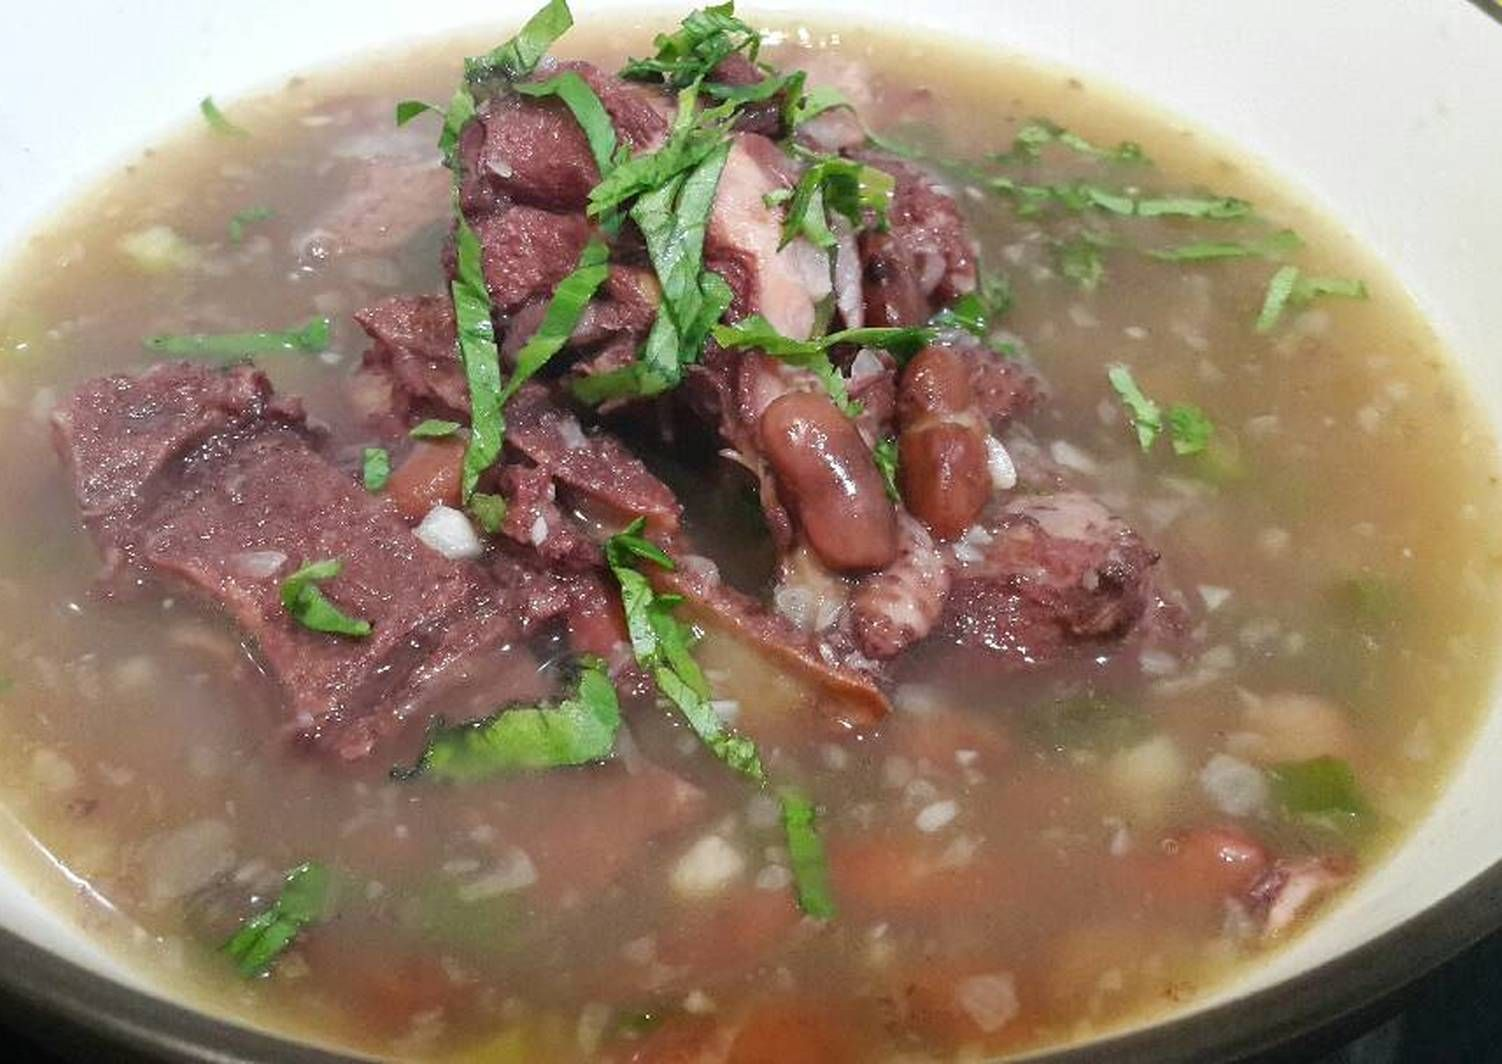 Resep Sup Kacang Merah Manado Brenebon Oleh Ells Cooking Resep Resep Sup Resep Masakan Indonesia Sup Kacang